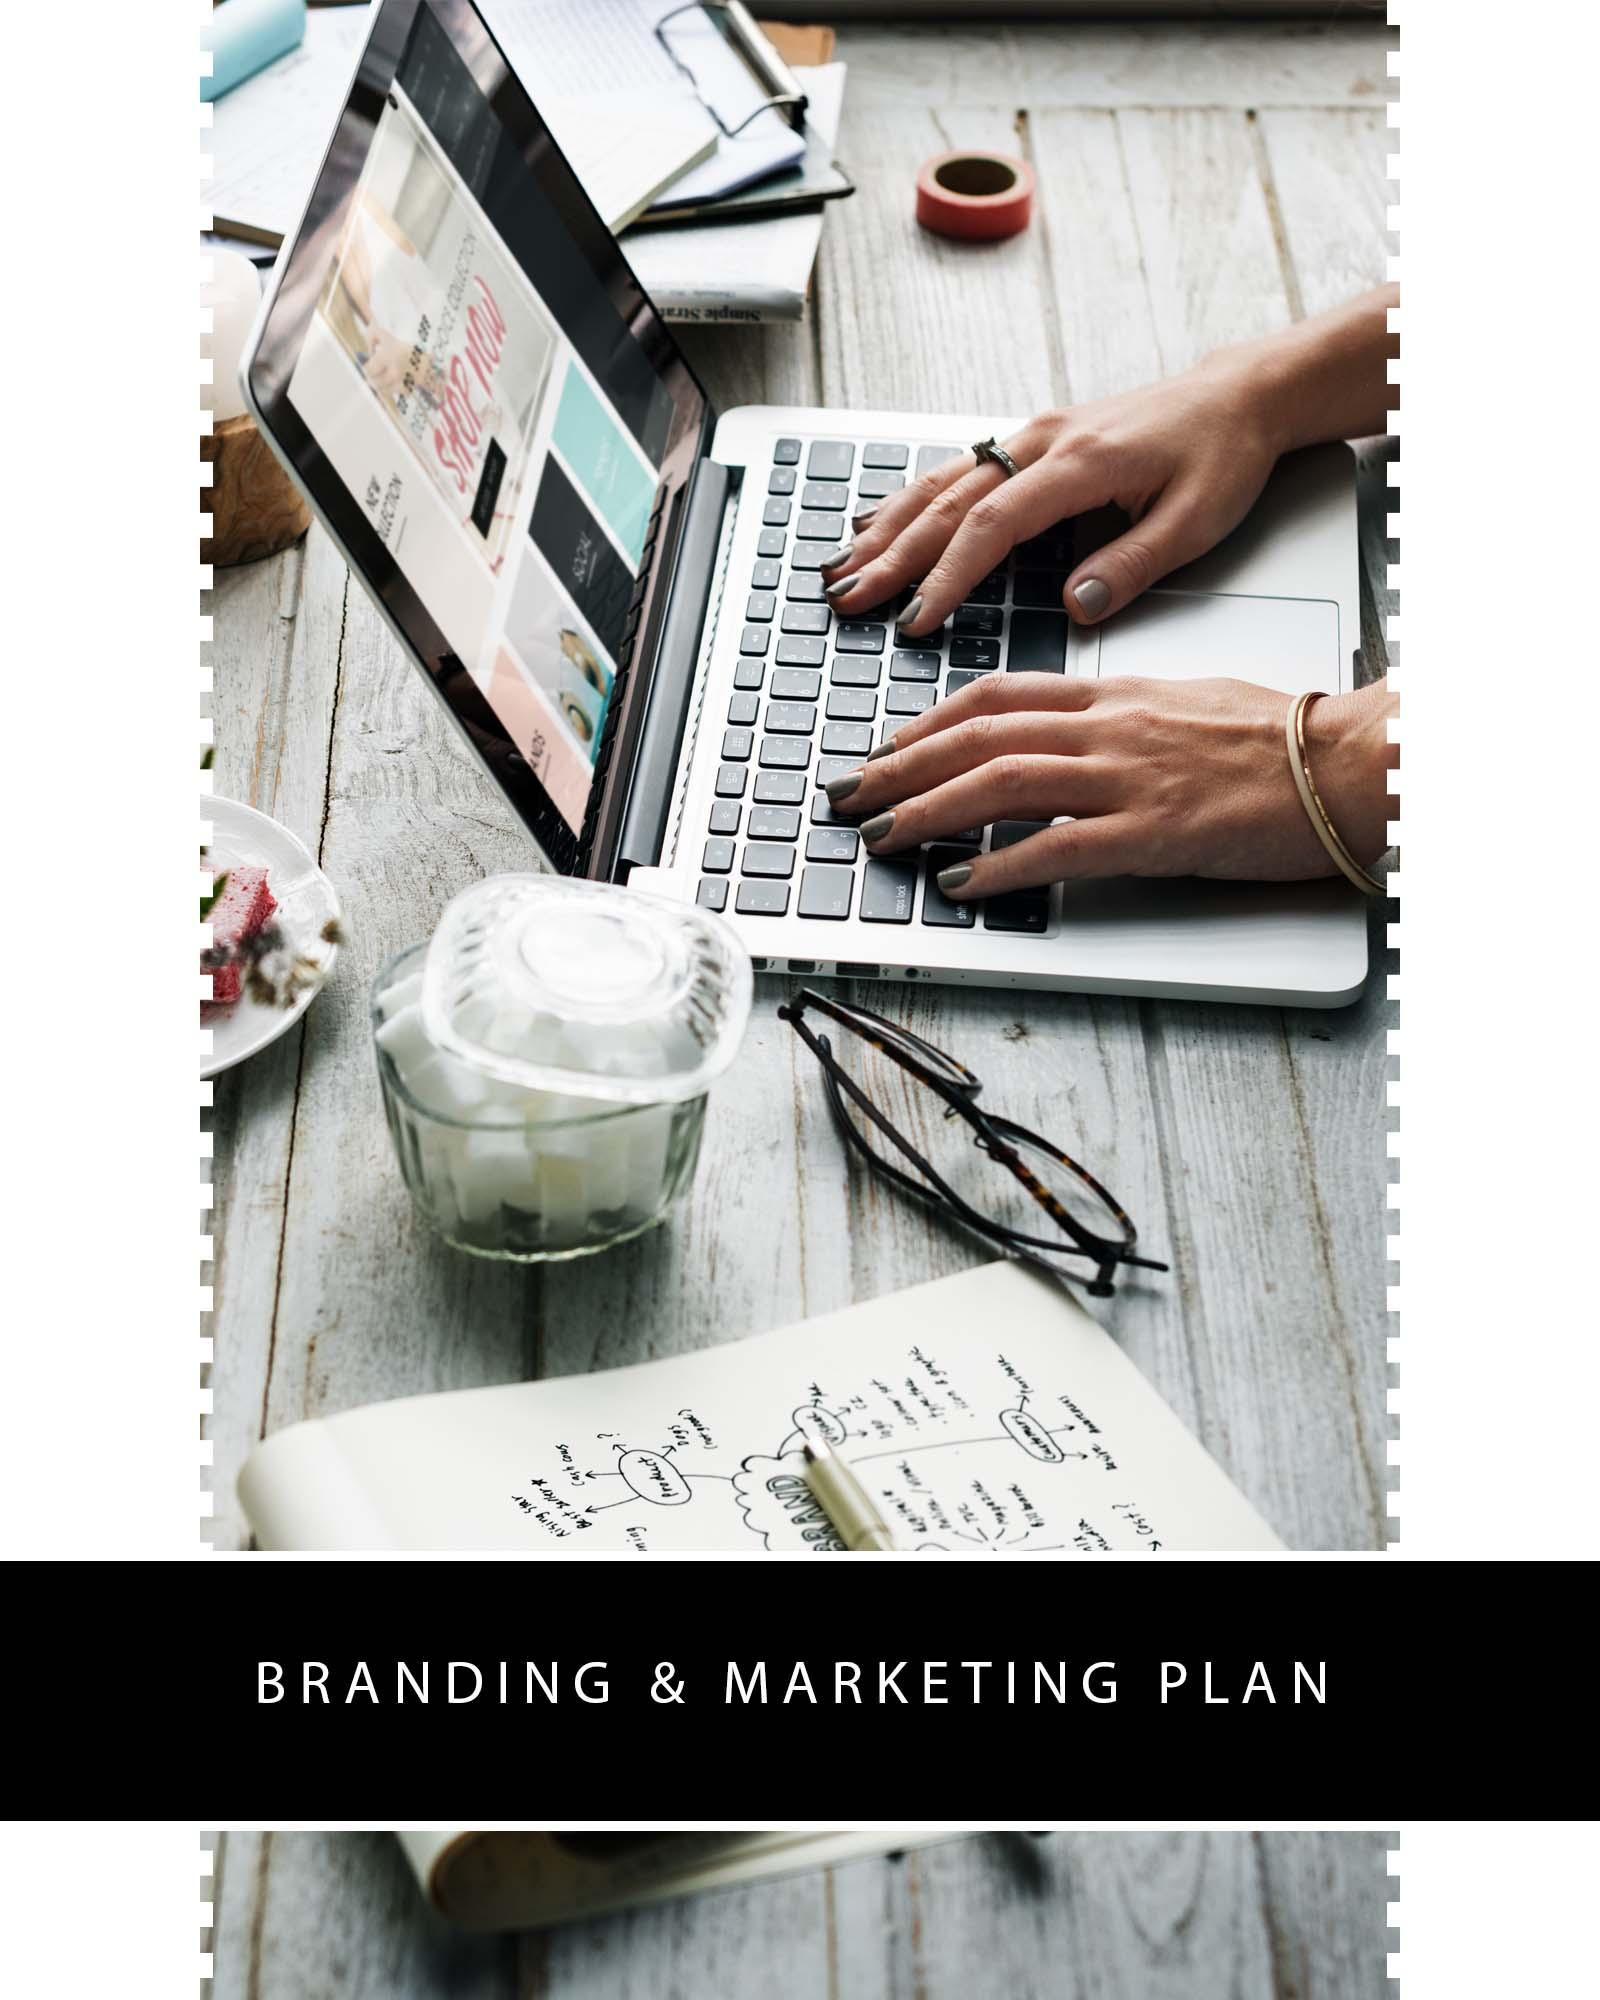 branding and marketing plan.jpg